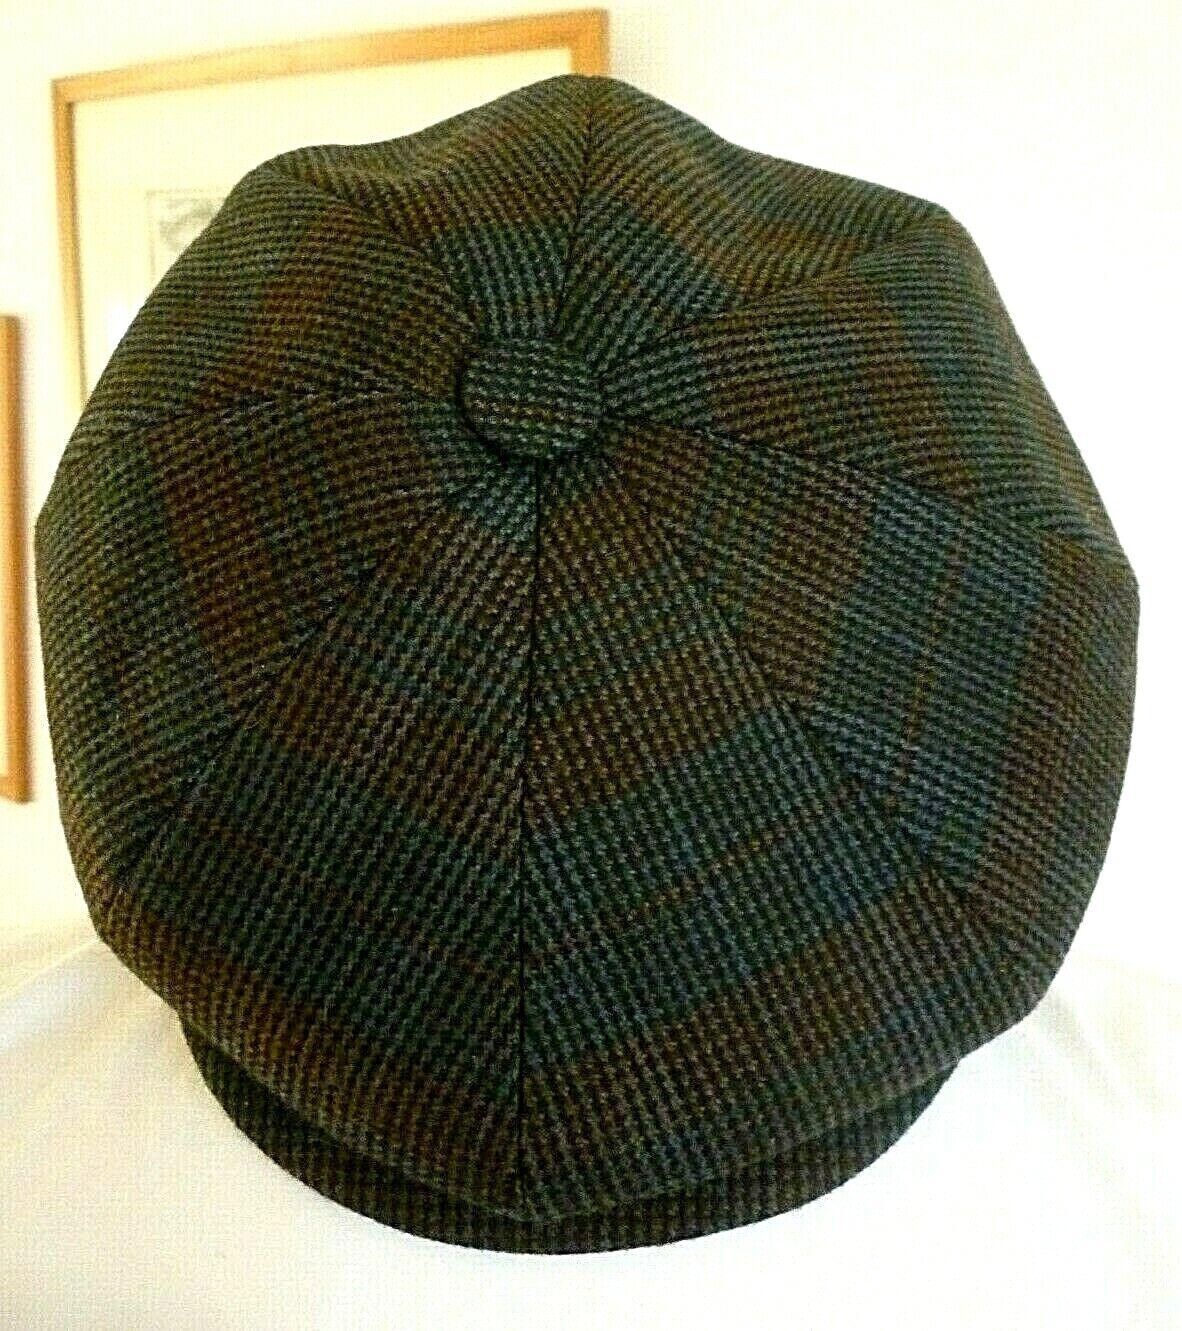 Ballonmütze Wolle Flatcap Wollkappe Bakerboy Schiebermütze Kappe Cap Blau Braun